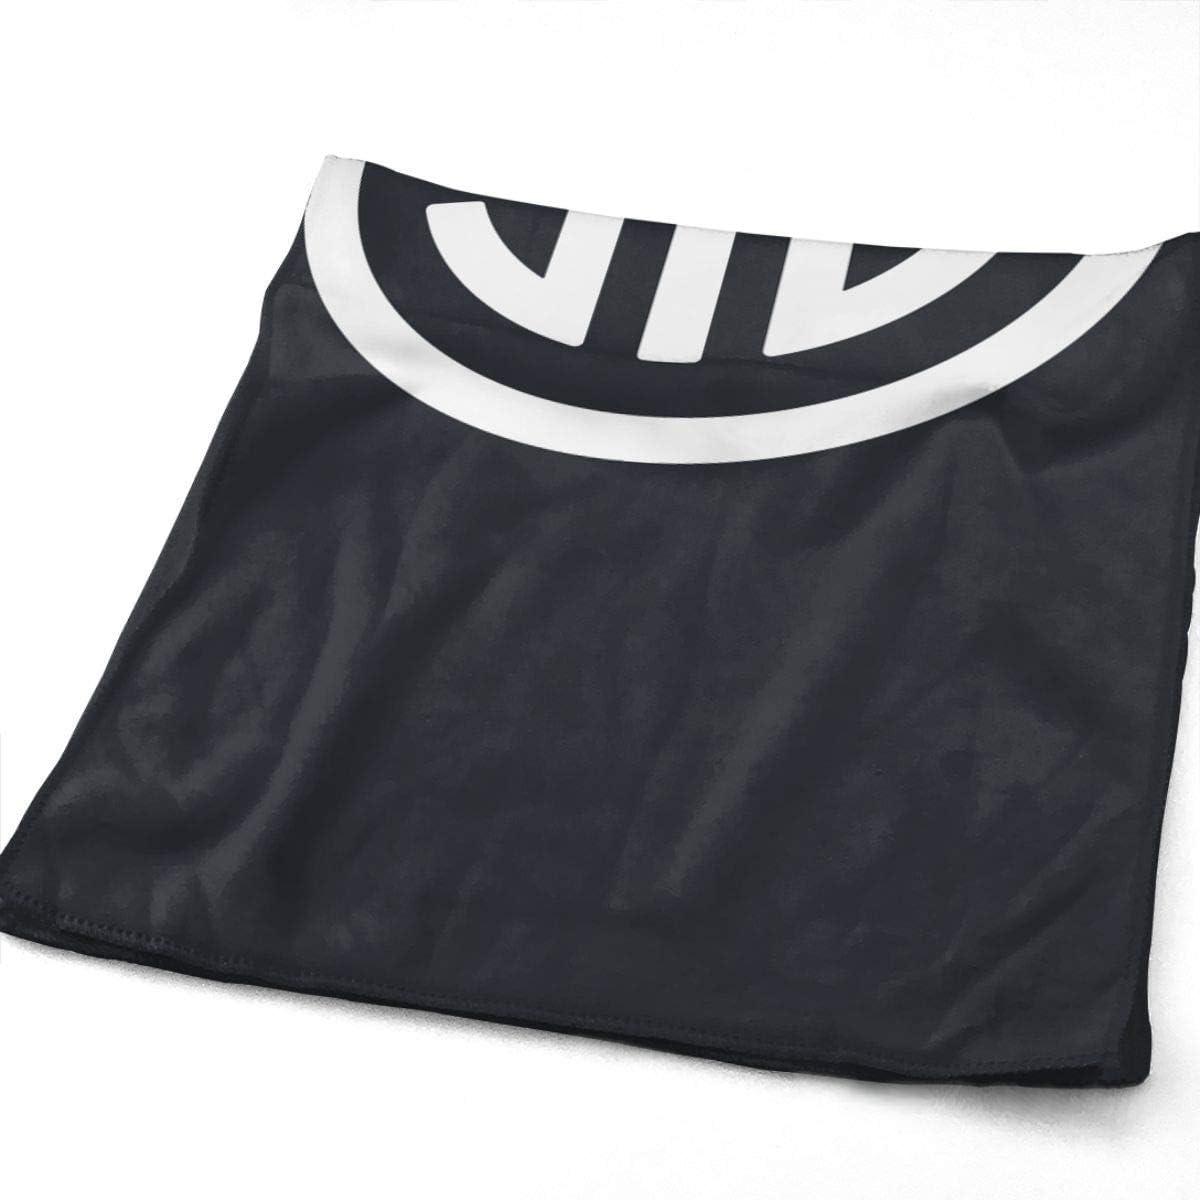 ERCGY Best SIG SAUER Towel